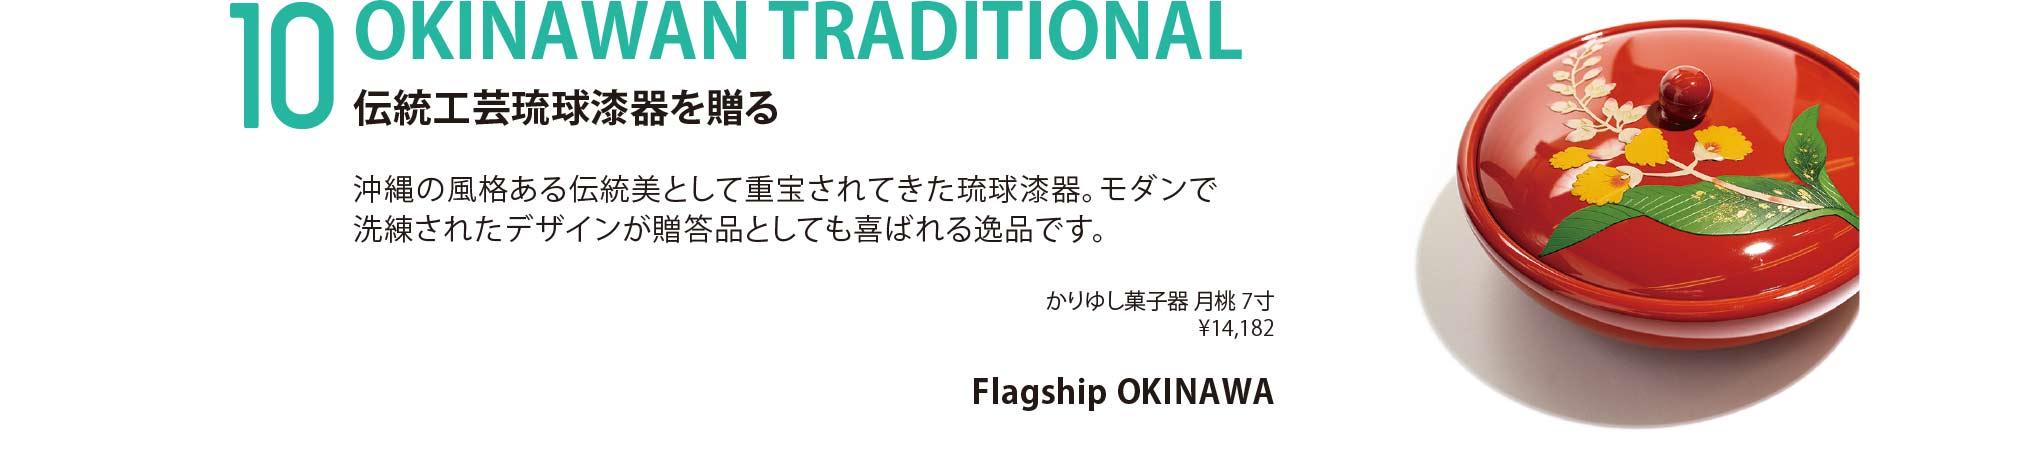 OKINAWAN TRADITIONAL 伝統工芸琉球漆器を贈る